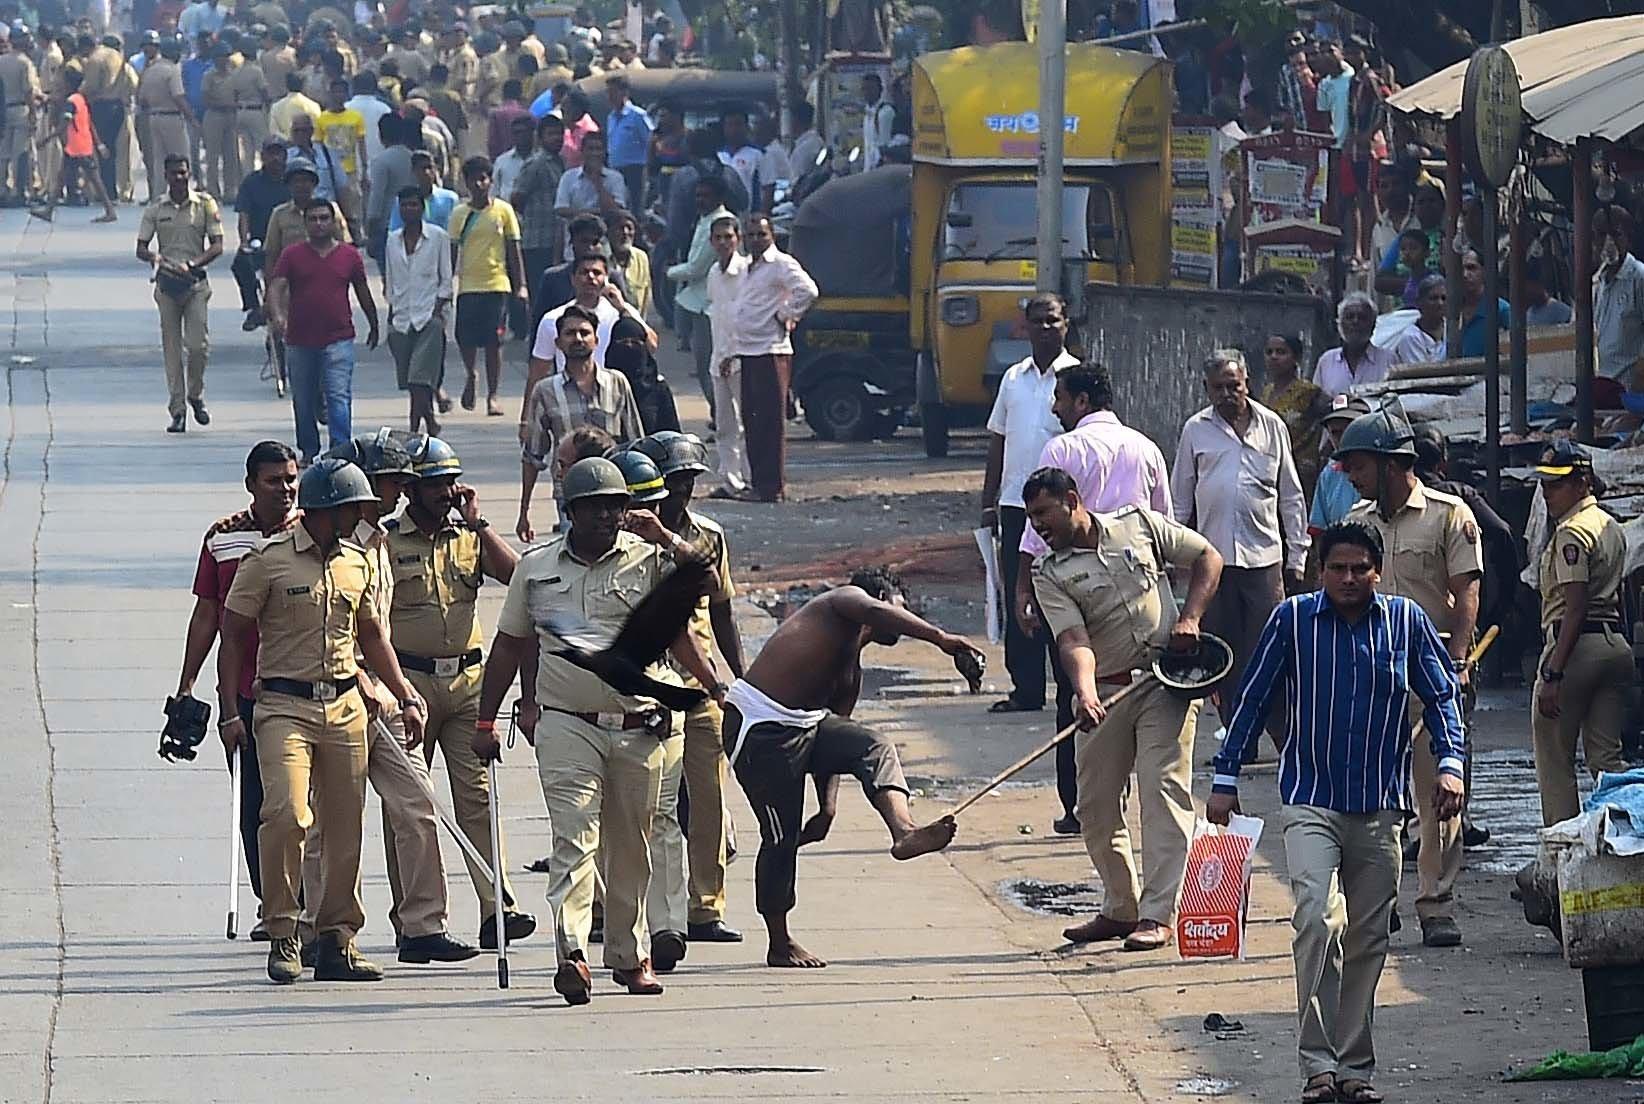 Bhima-Koregaon: Cops Fighting 'Campaign Of Hate' On Social Media Ahead Of